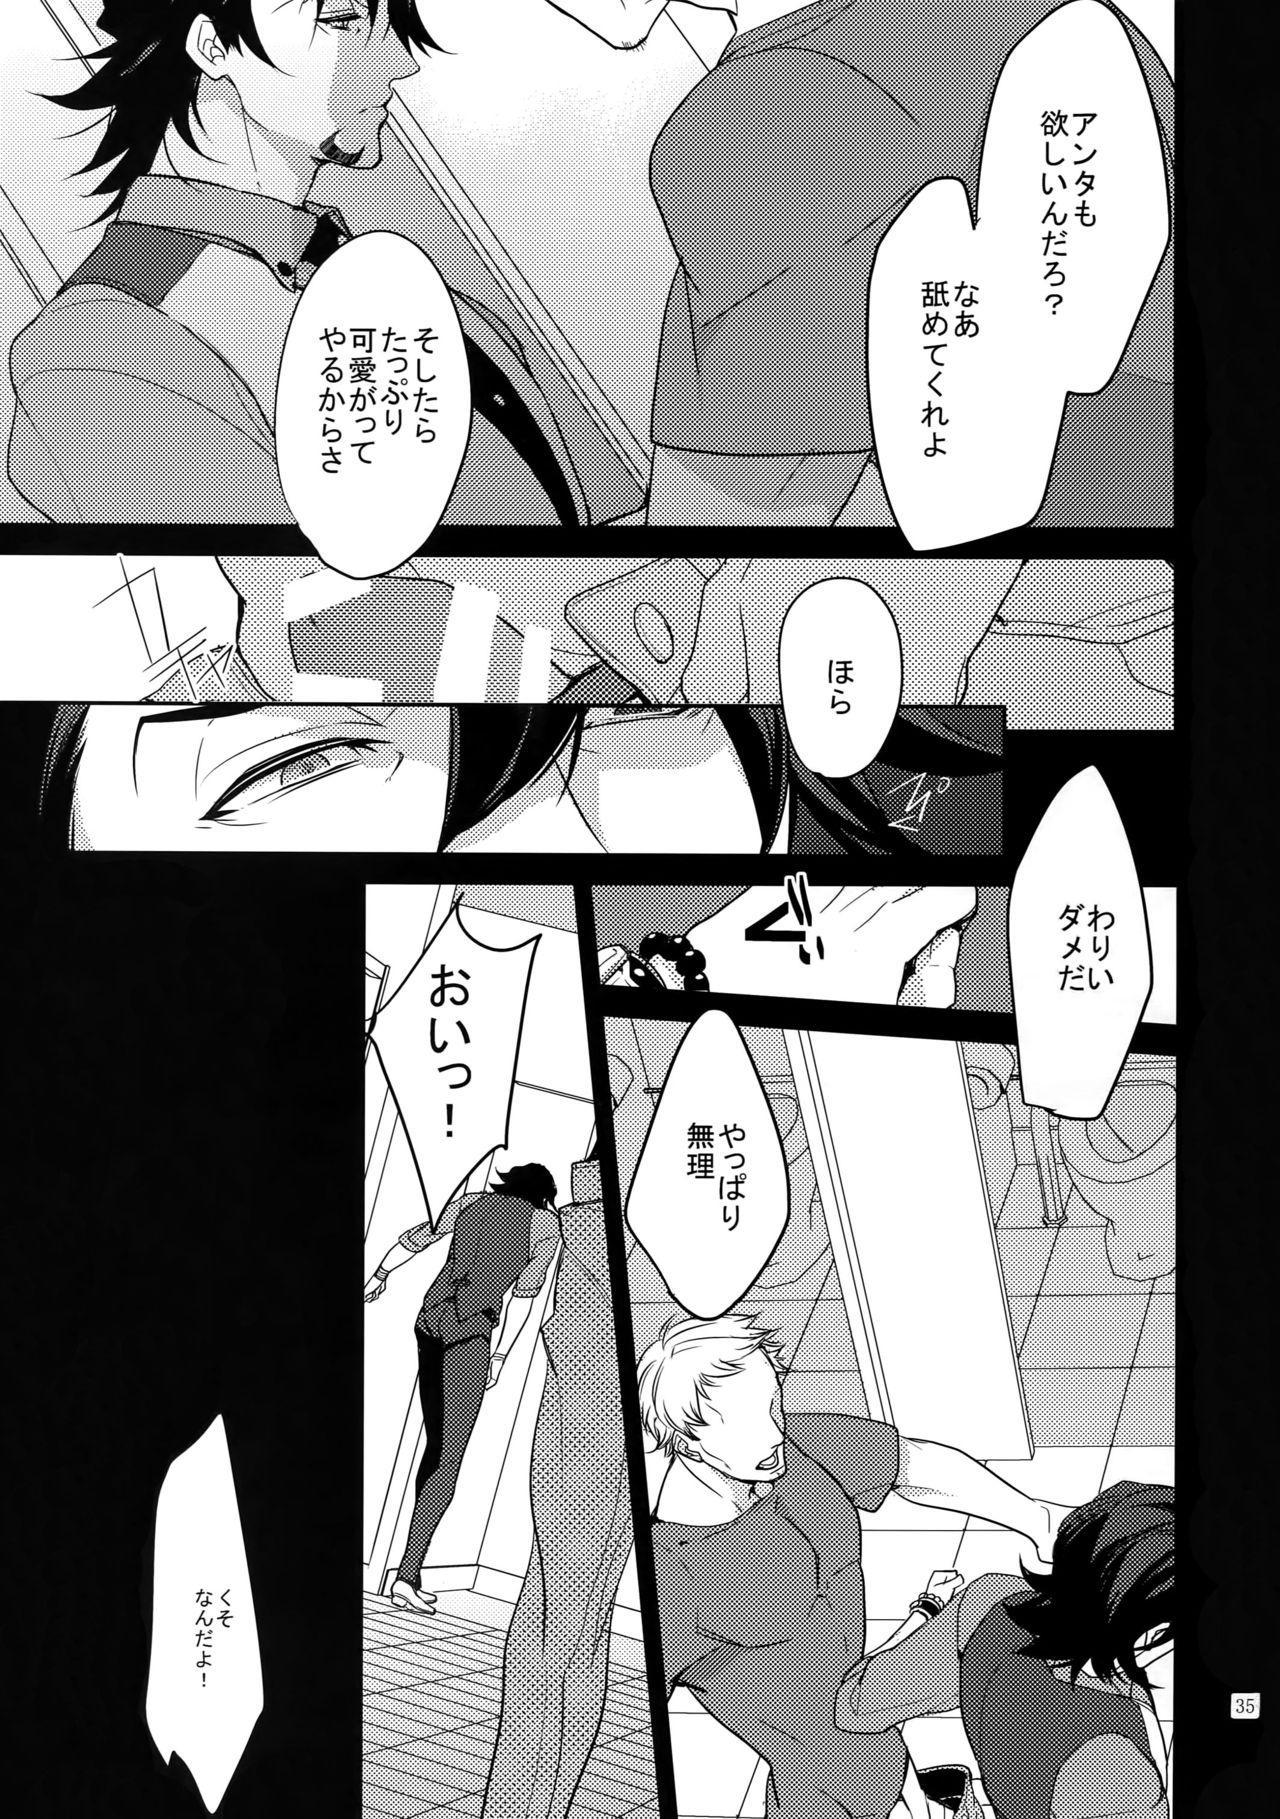 BOROZS Usagi Tora Sairoku 2 33